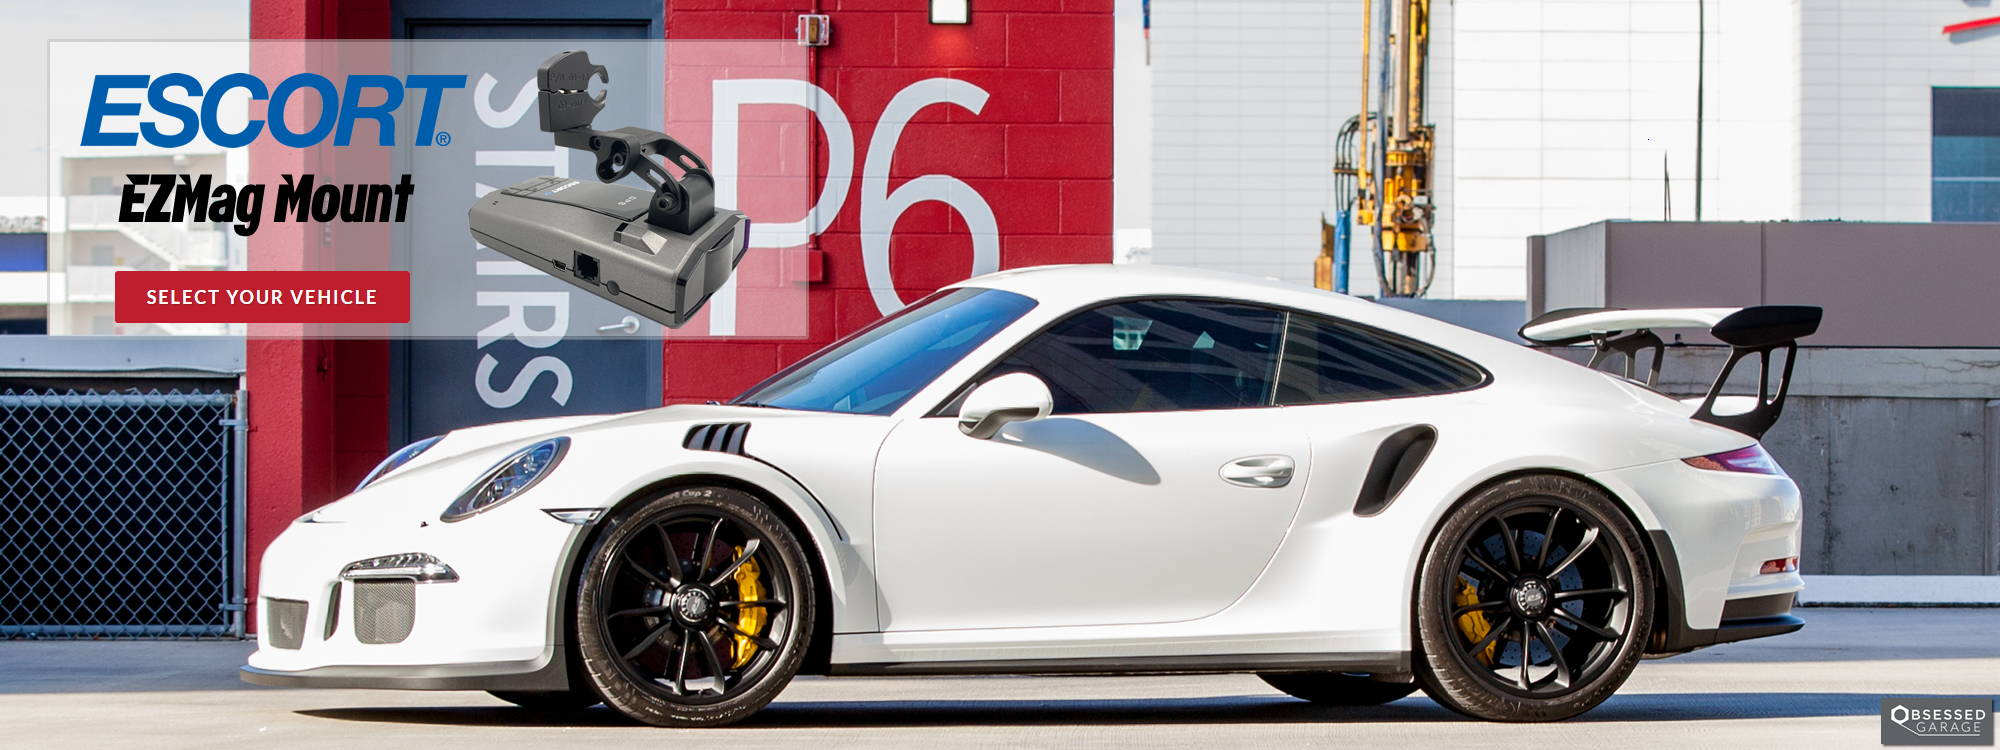 BlendMount Escort EZMag Mount Porsche GT3 RS